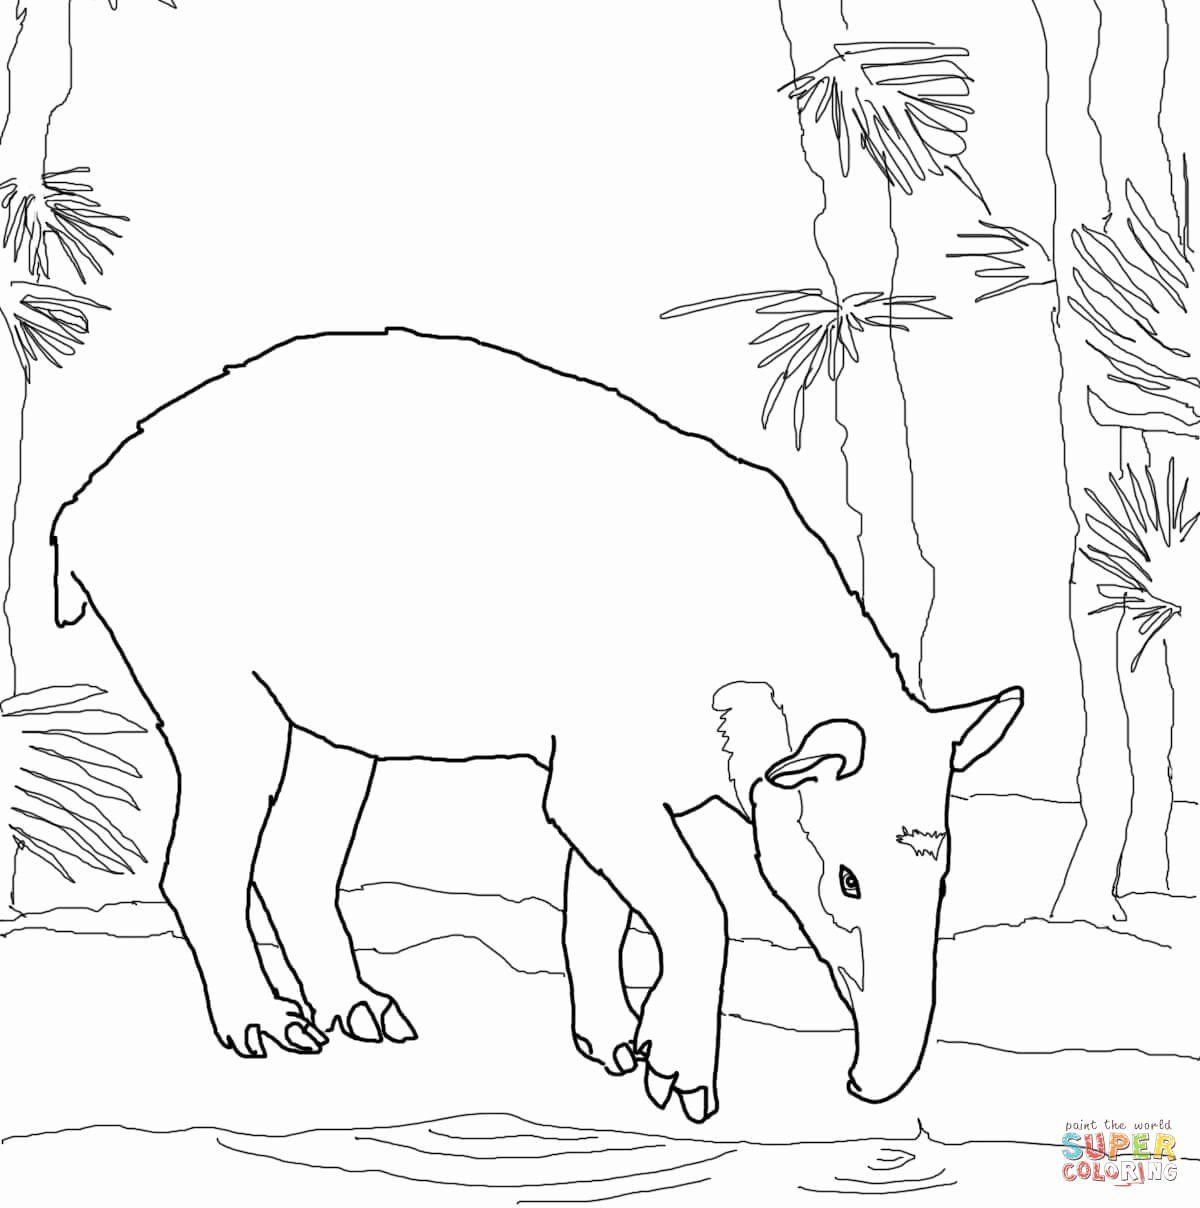 Coloring Pictures Of Trees Elegant Tapir Coloring Pages Di 2020